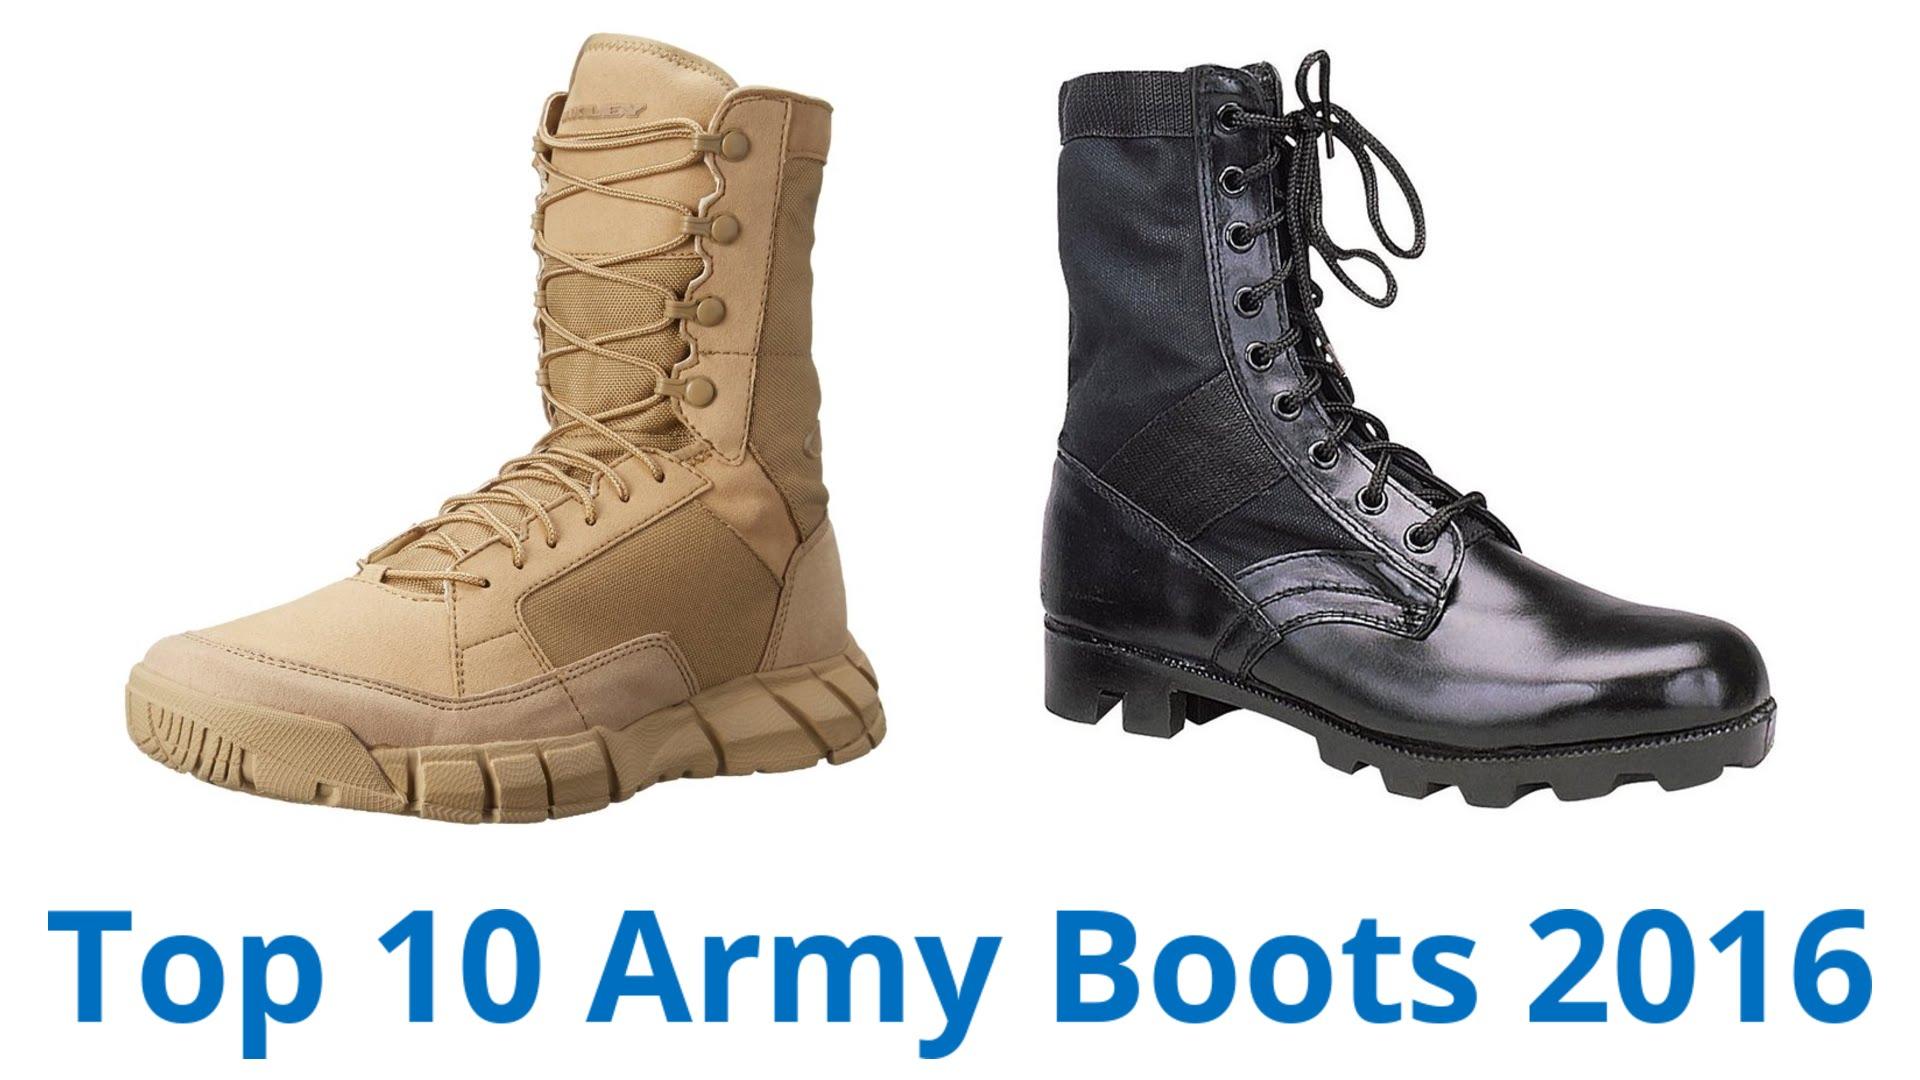 10 best army boots 2016 yurdmot